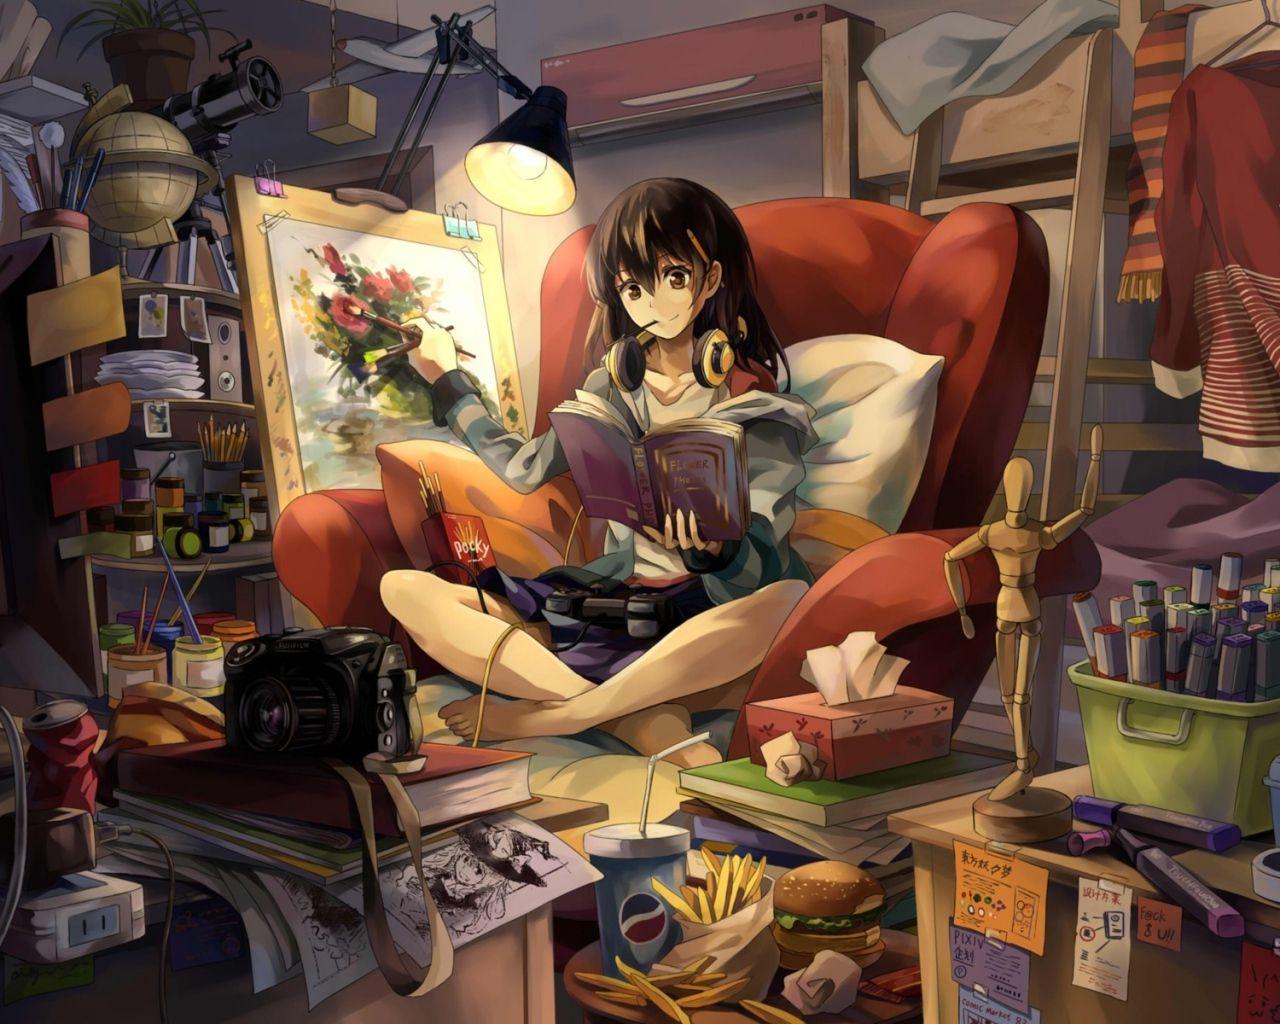 1280x1024 Wallpaper neko, yanshoujie, room, girl, graphic